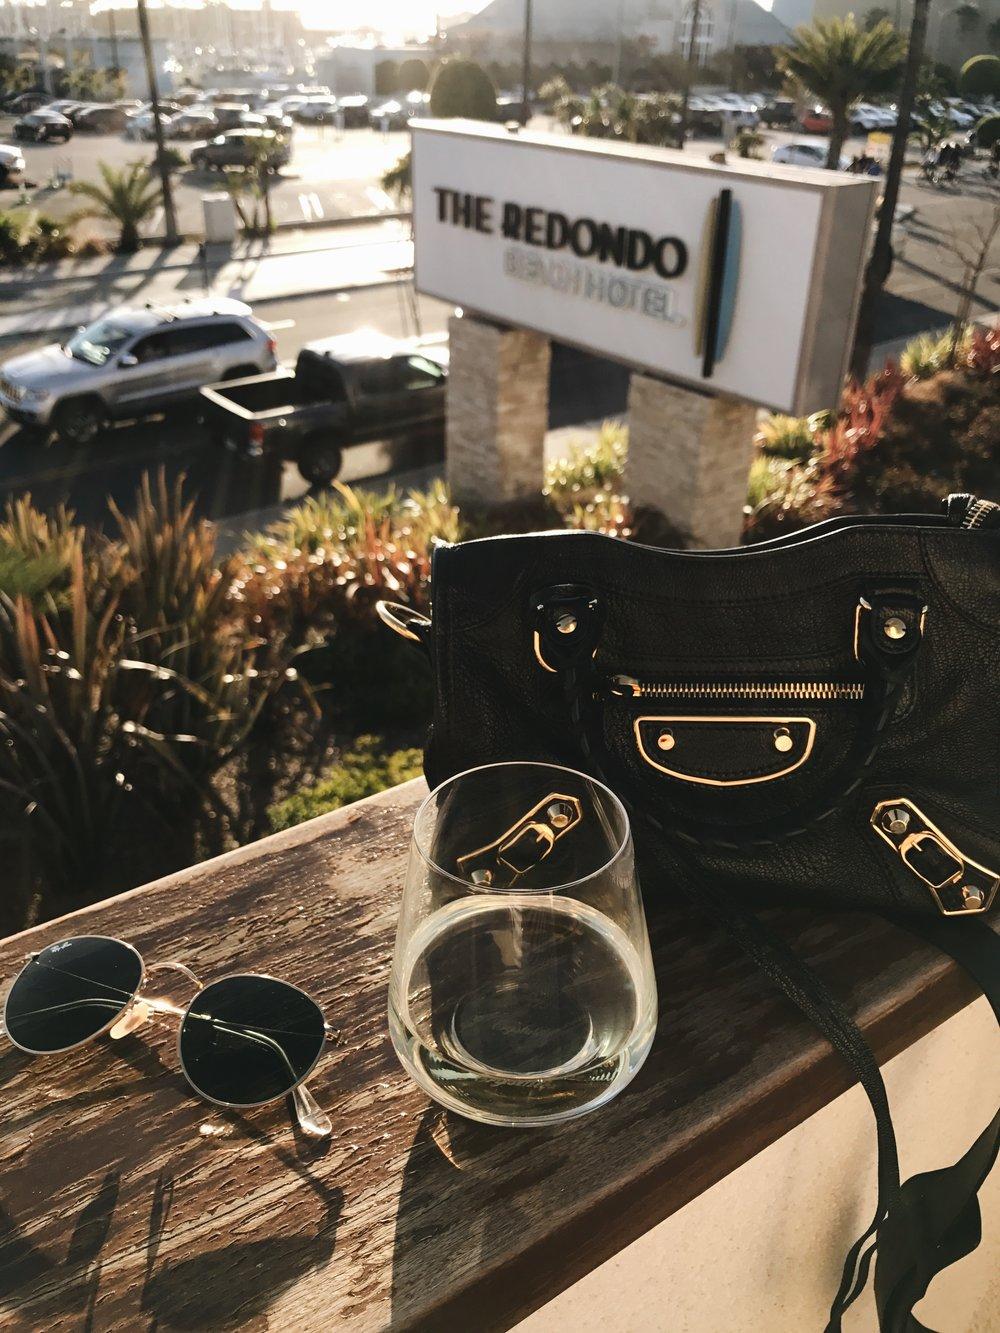 A Weekend in Redondo Beach | truelane